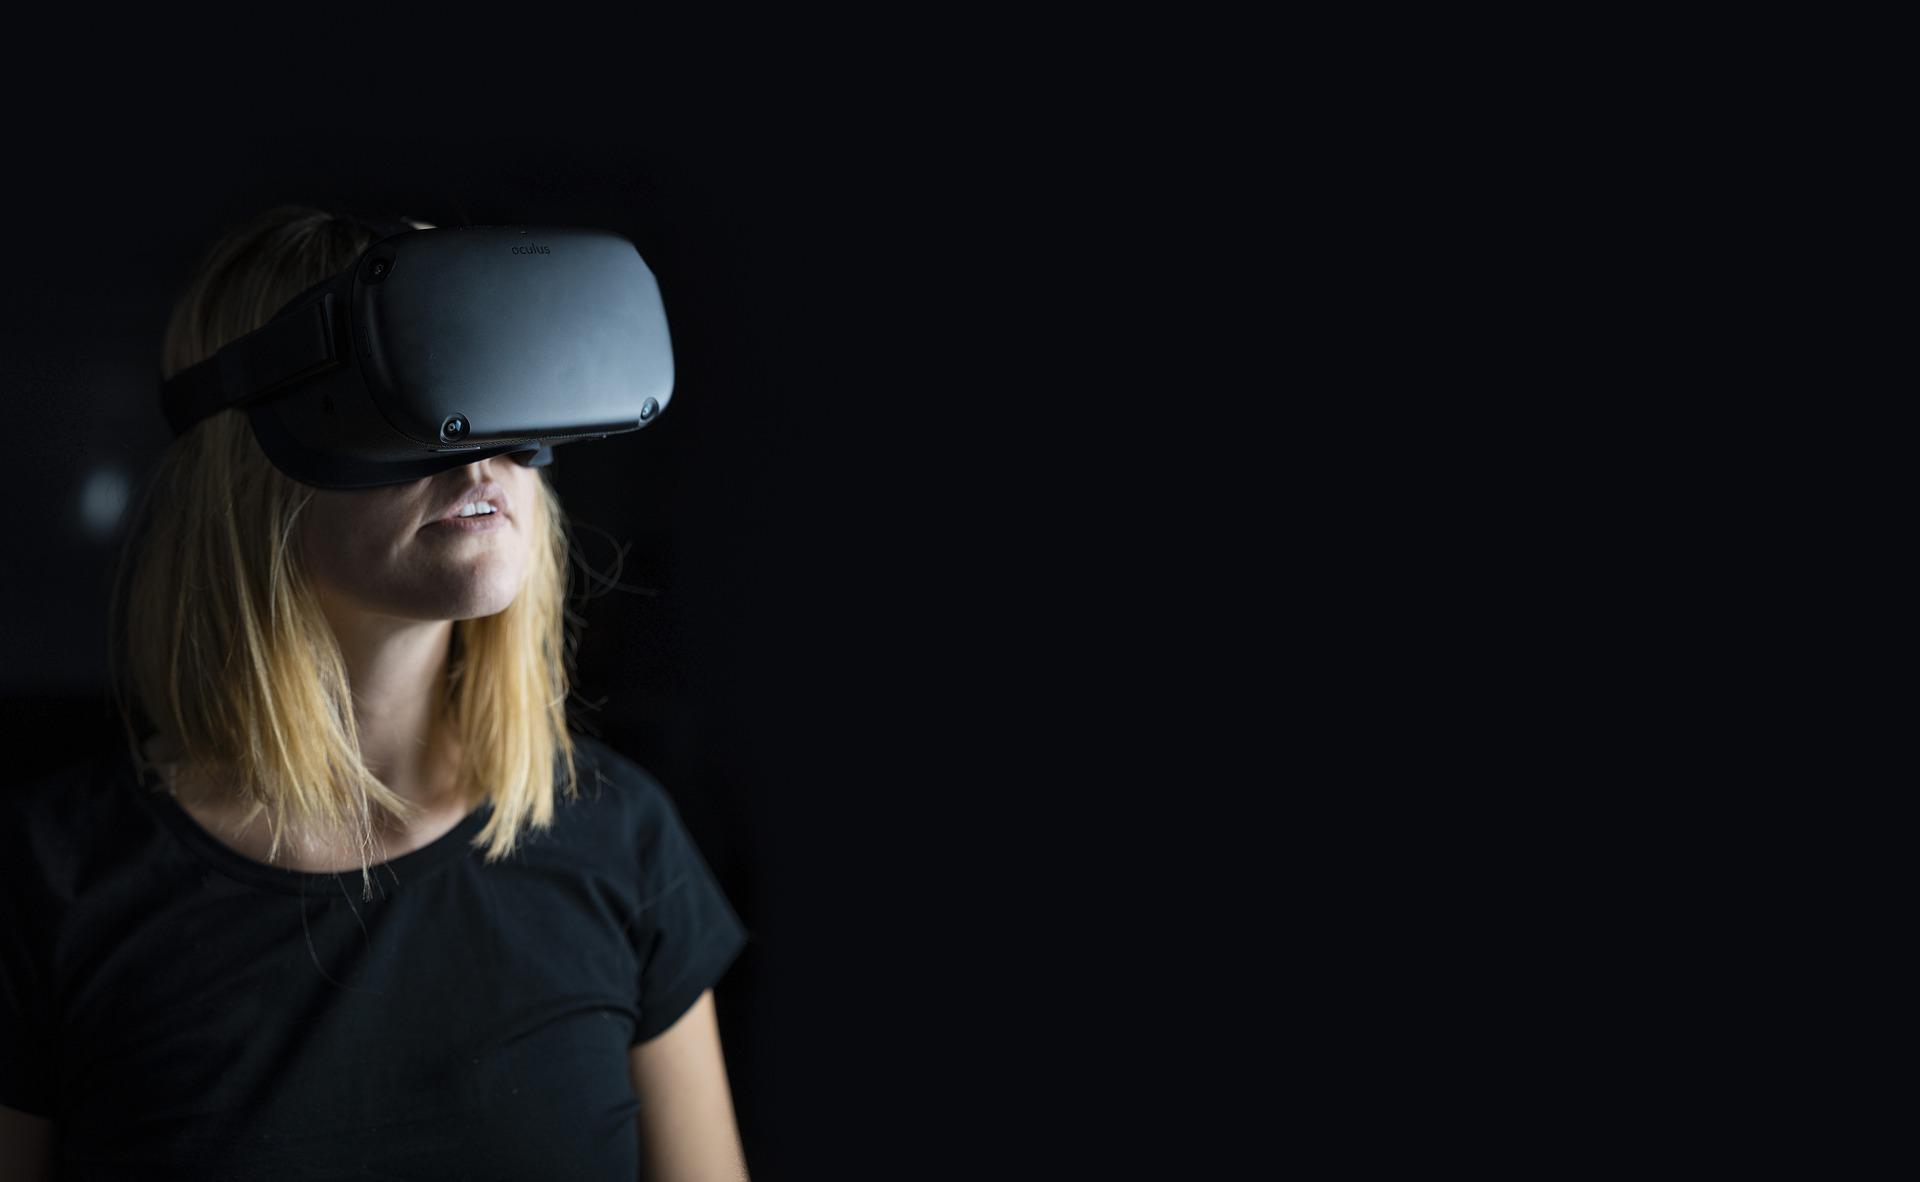 virtual-reality-4490469_1920.jpg